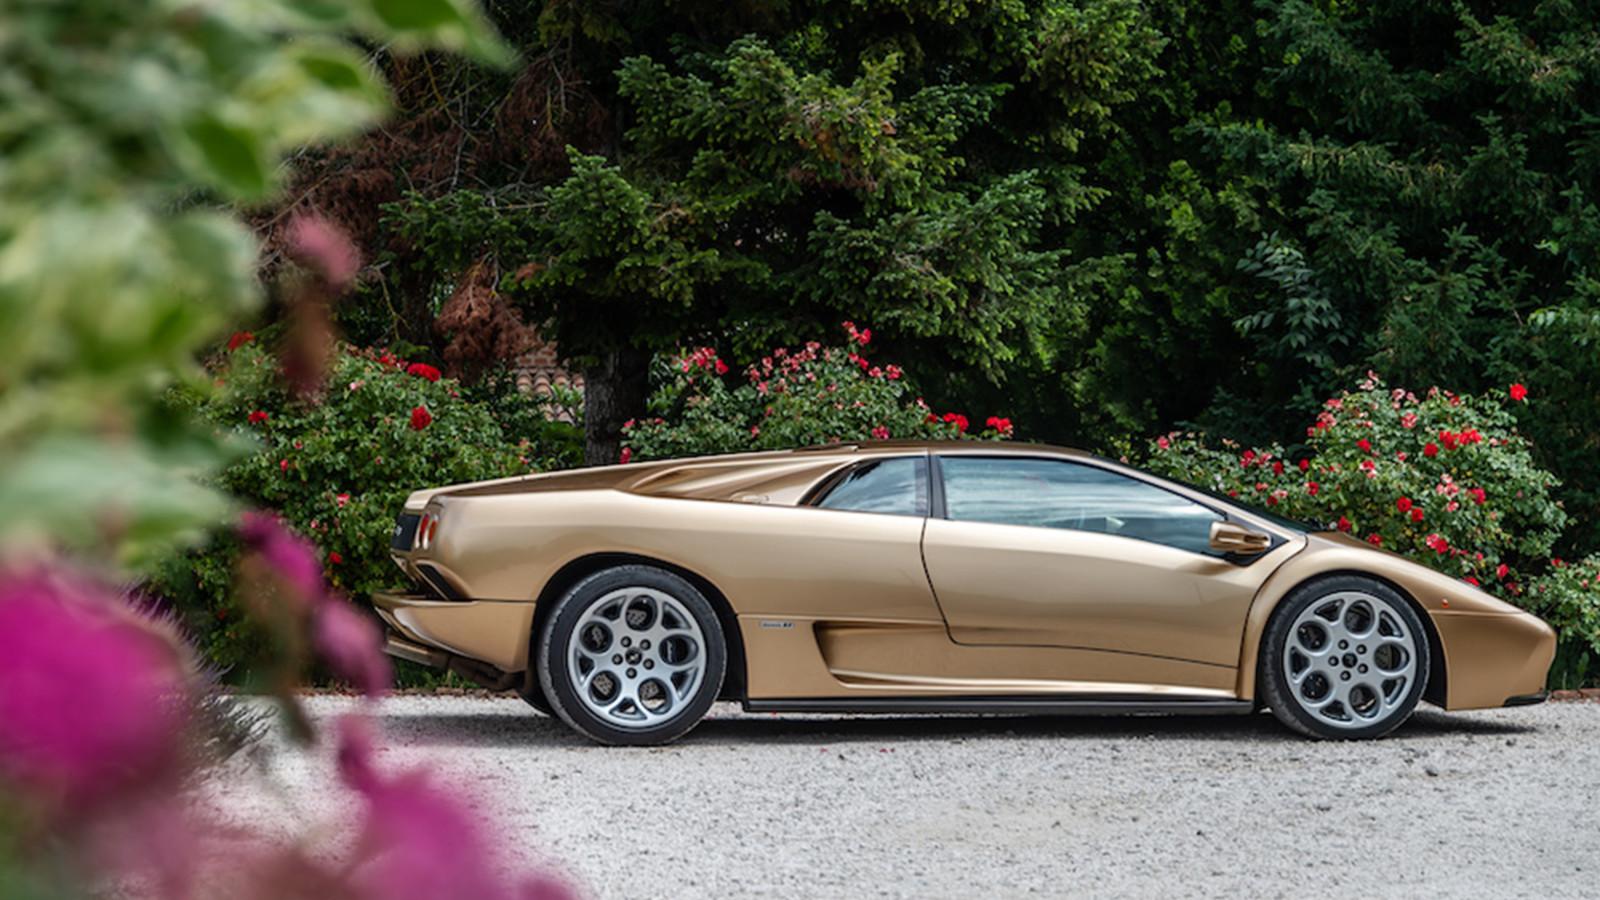 Der Lamborghini Diablo darf sich seit 2021 Oldtimer nennen.